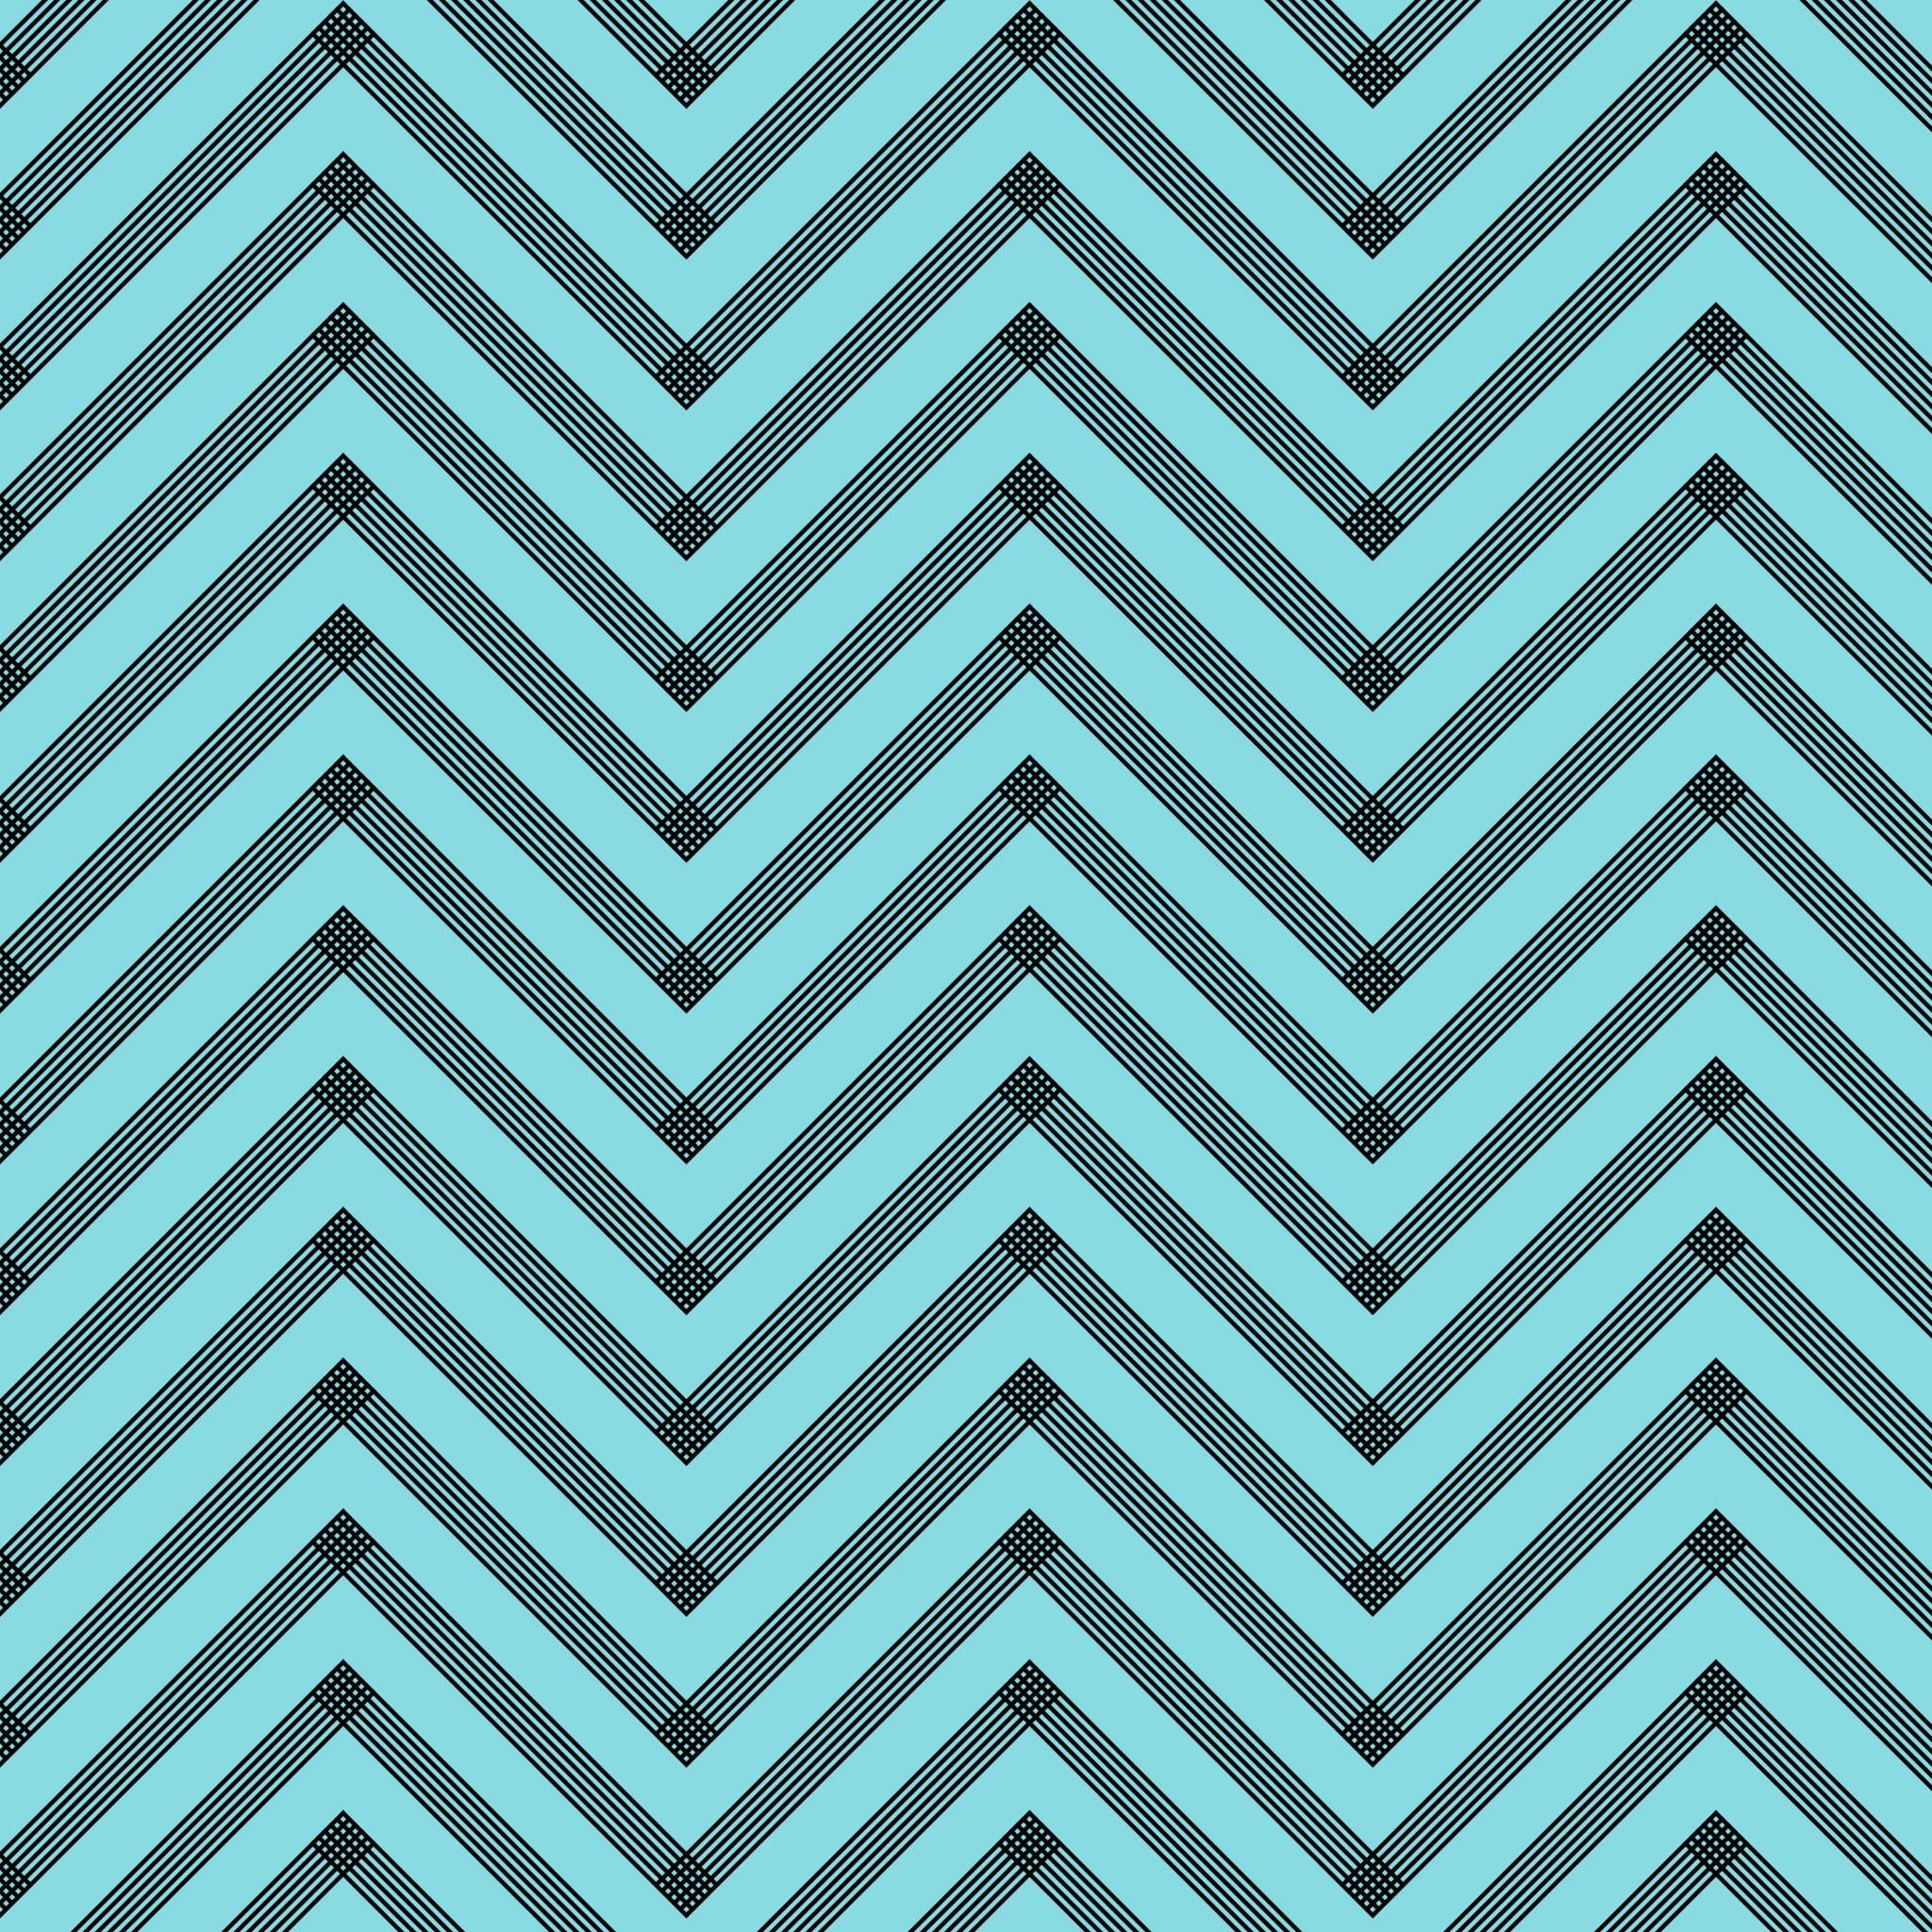 Navy Blue Chevron Wallpaper - WallpaperSafari